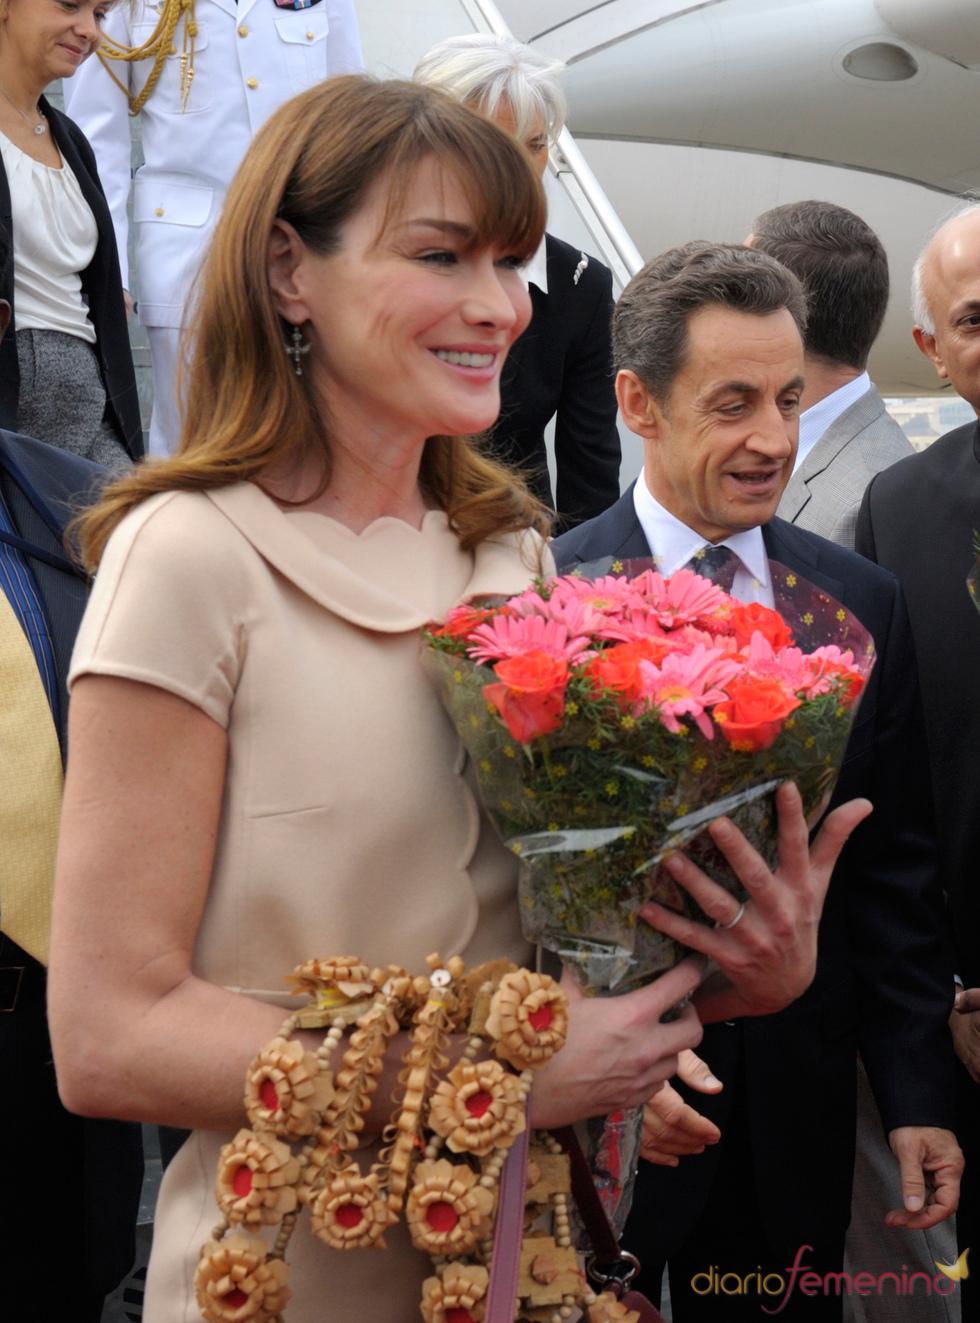 Carla Bruni recibe un ramo de flores a su llegada a la India